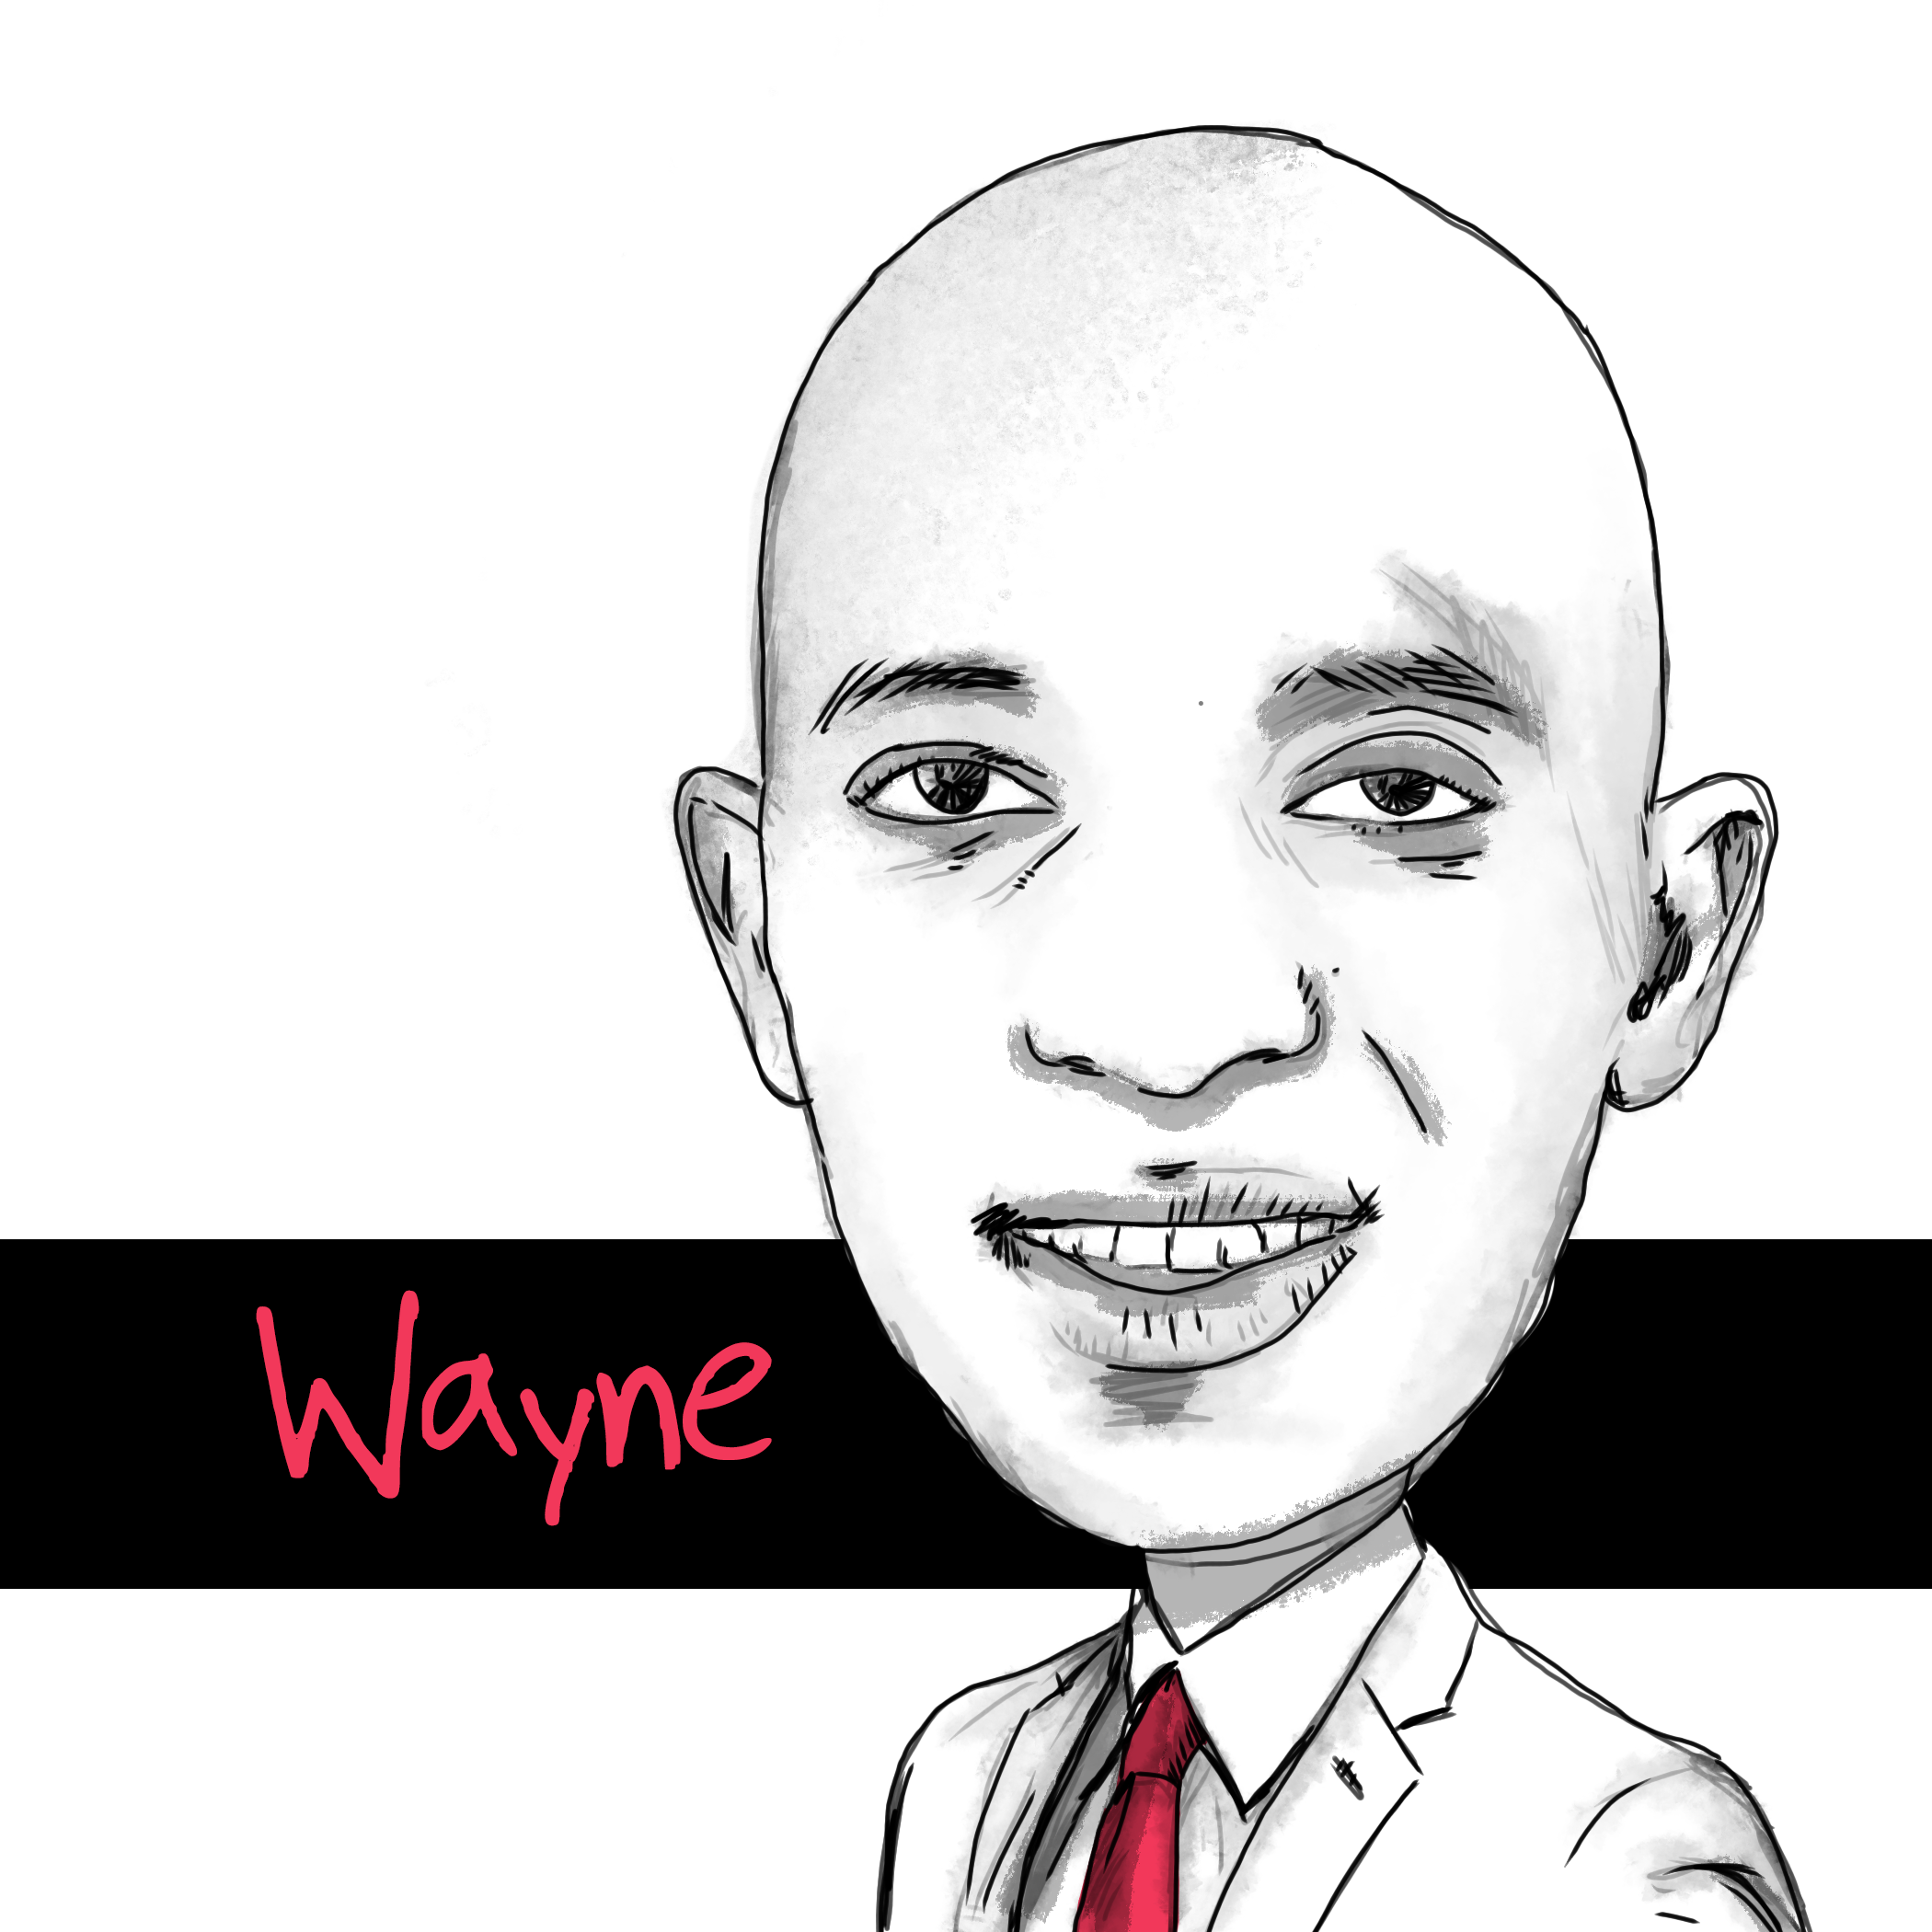 Wayne Messam - Change Can't Wait - https://wayneforamerica.com